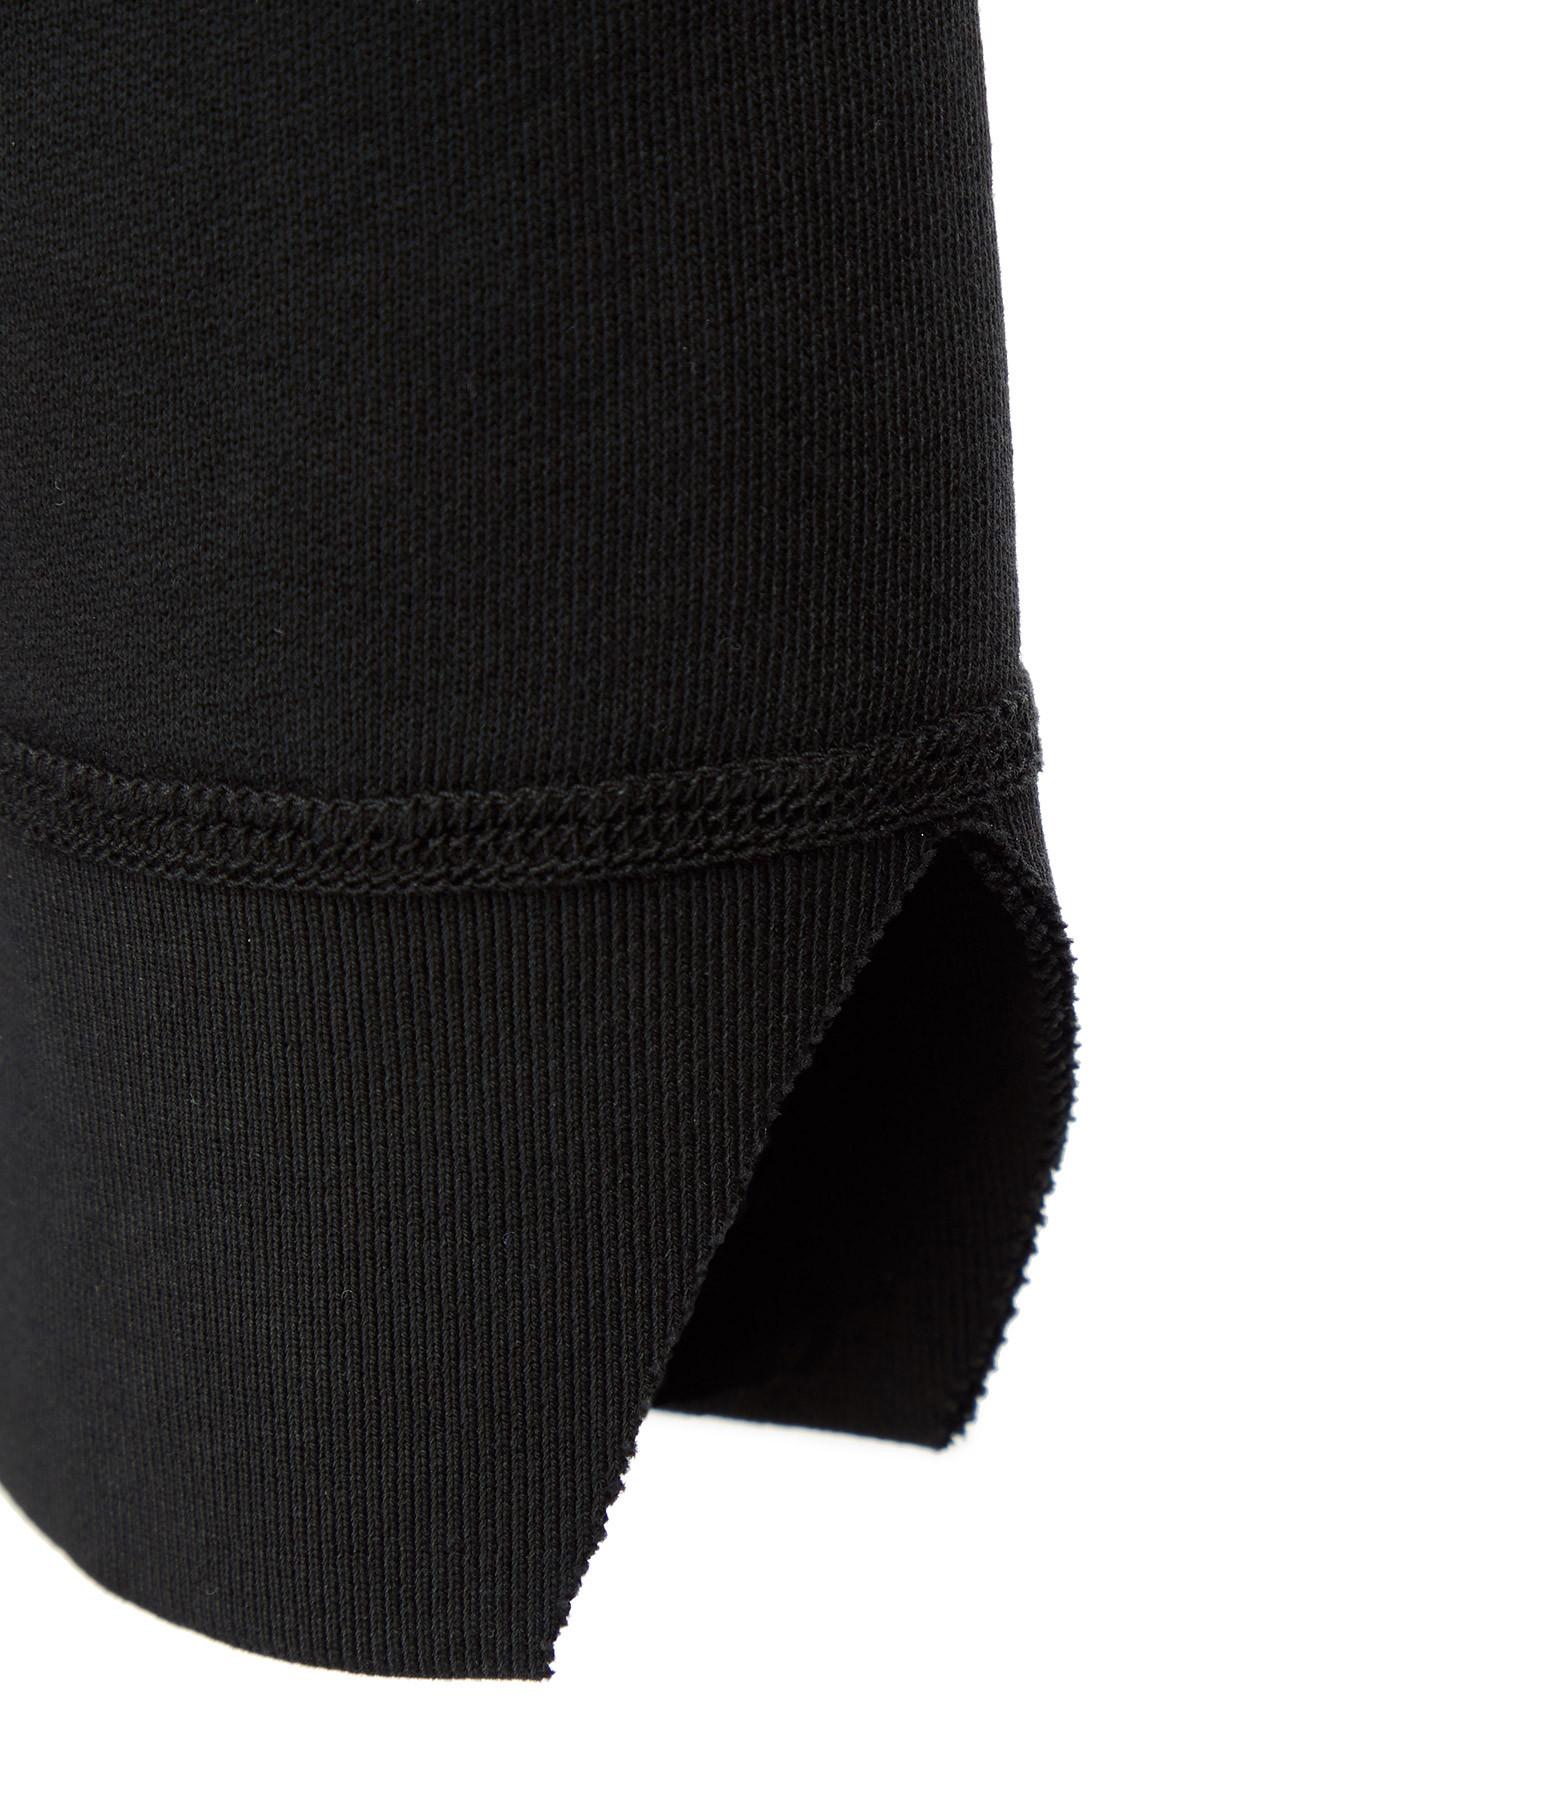 NILI LOTAN - Sweatshirt Luka Coton Noir